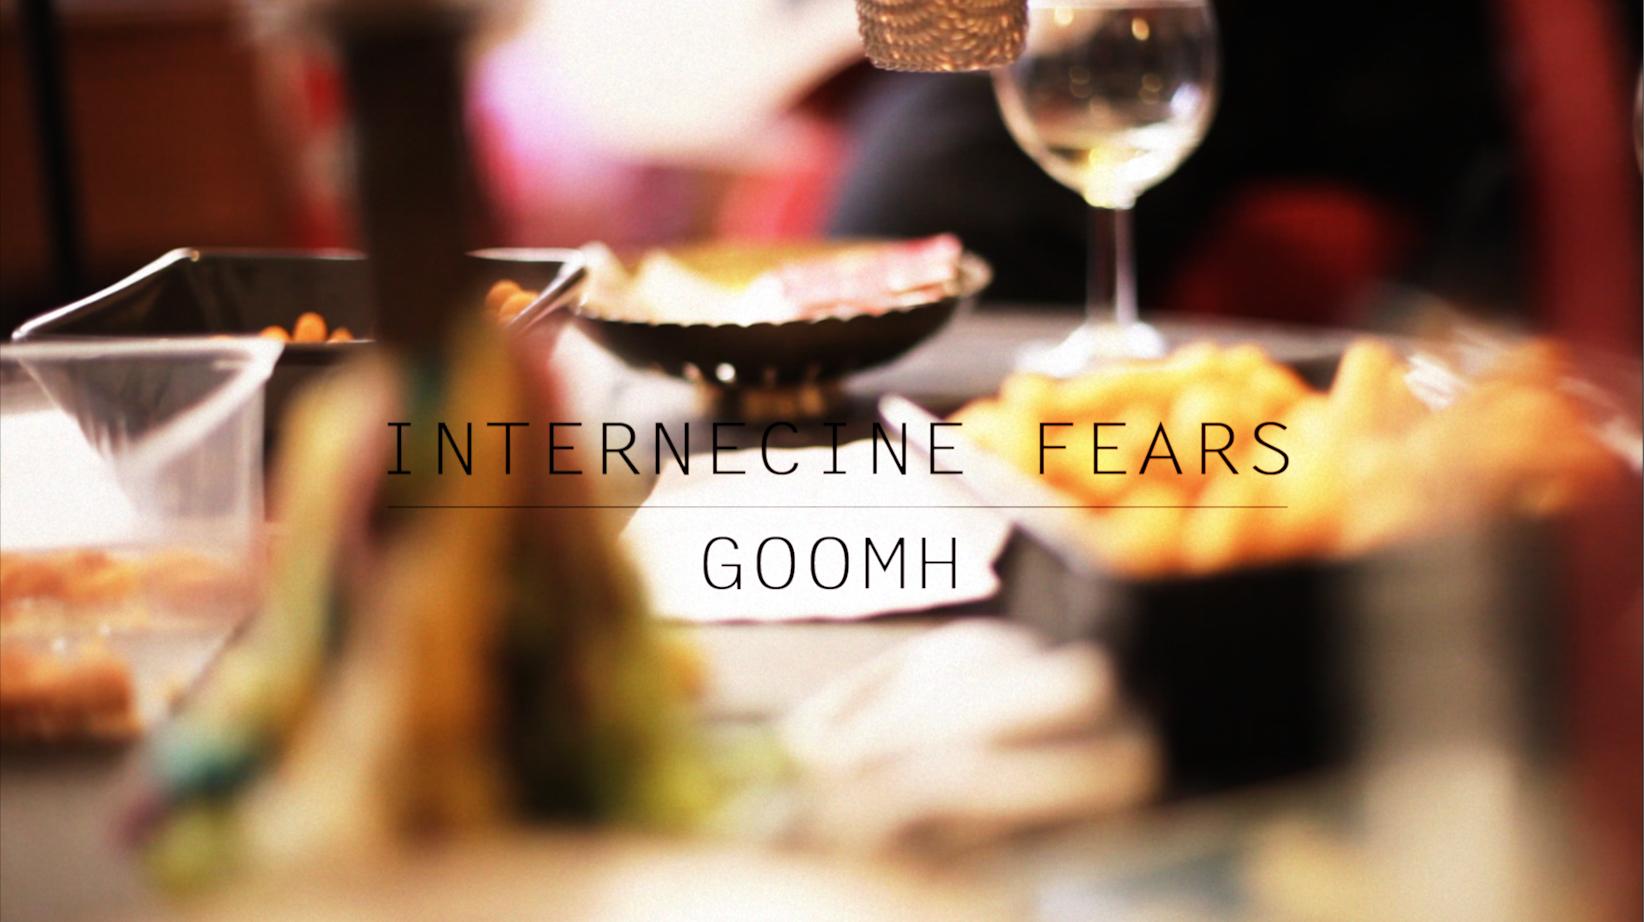 GOOMH - Internecine Fears (2011)